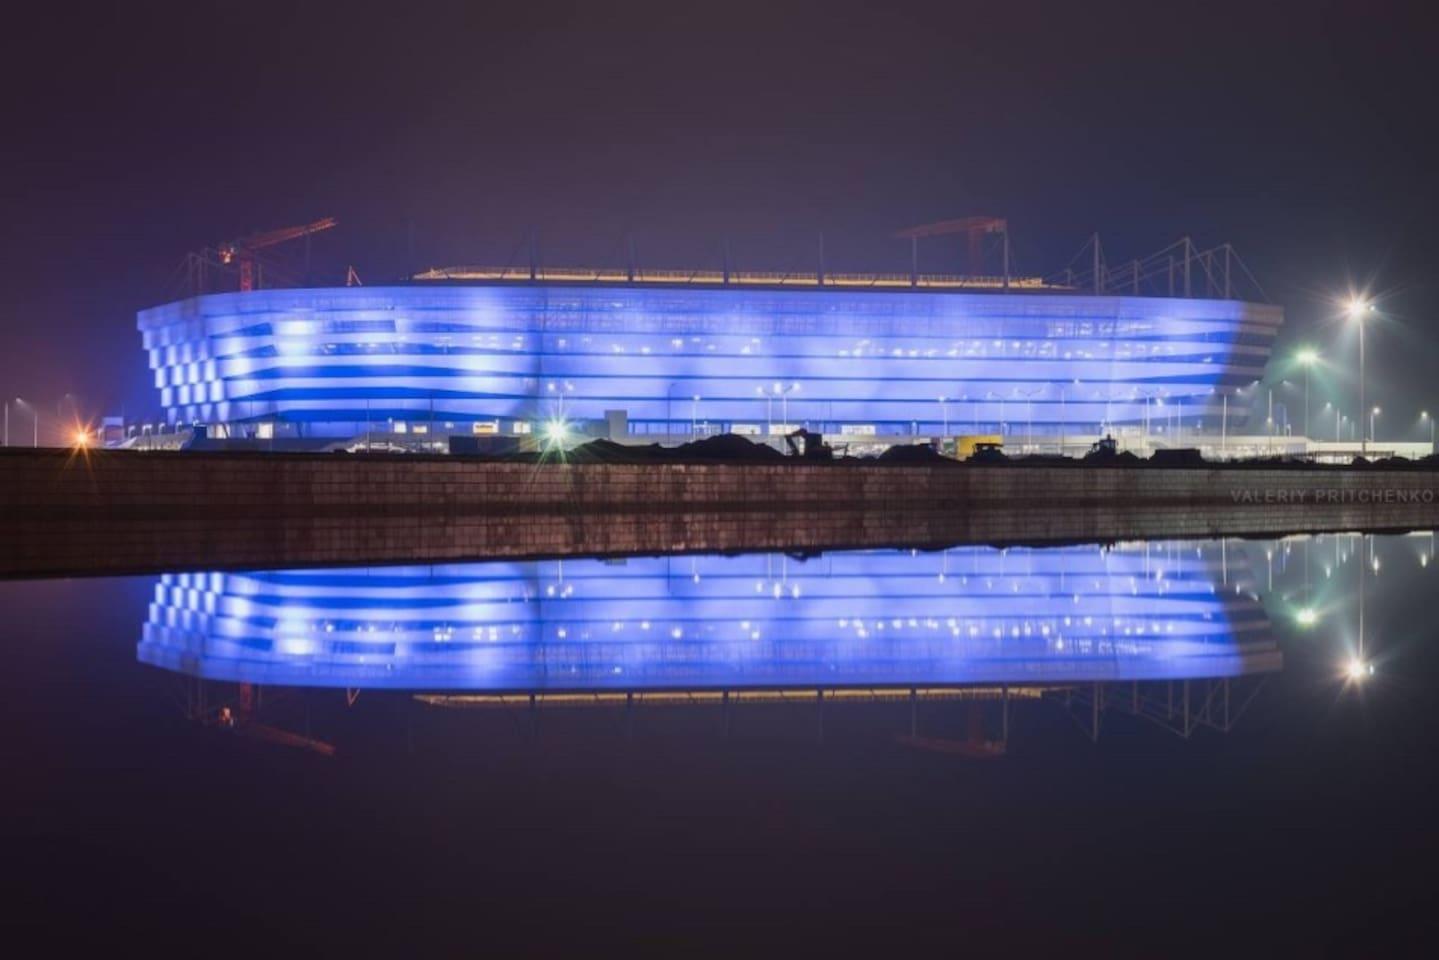 Kaliningrad stadium 2018